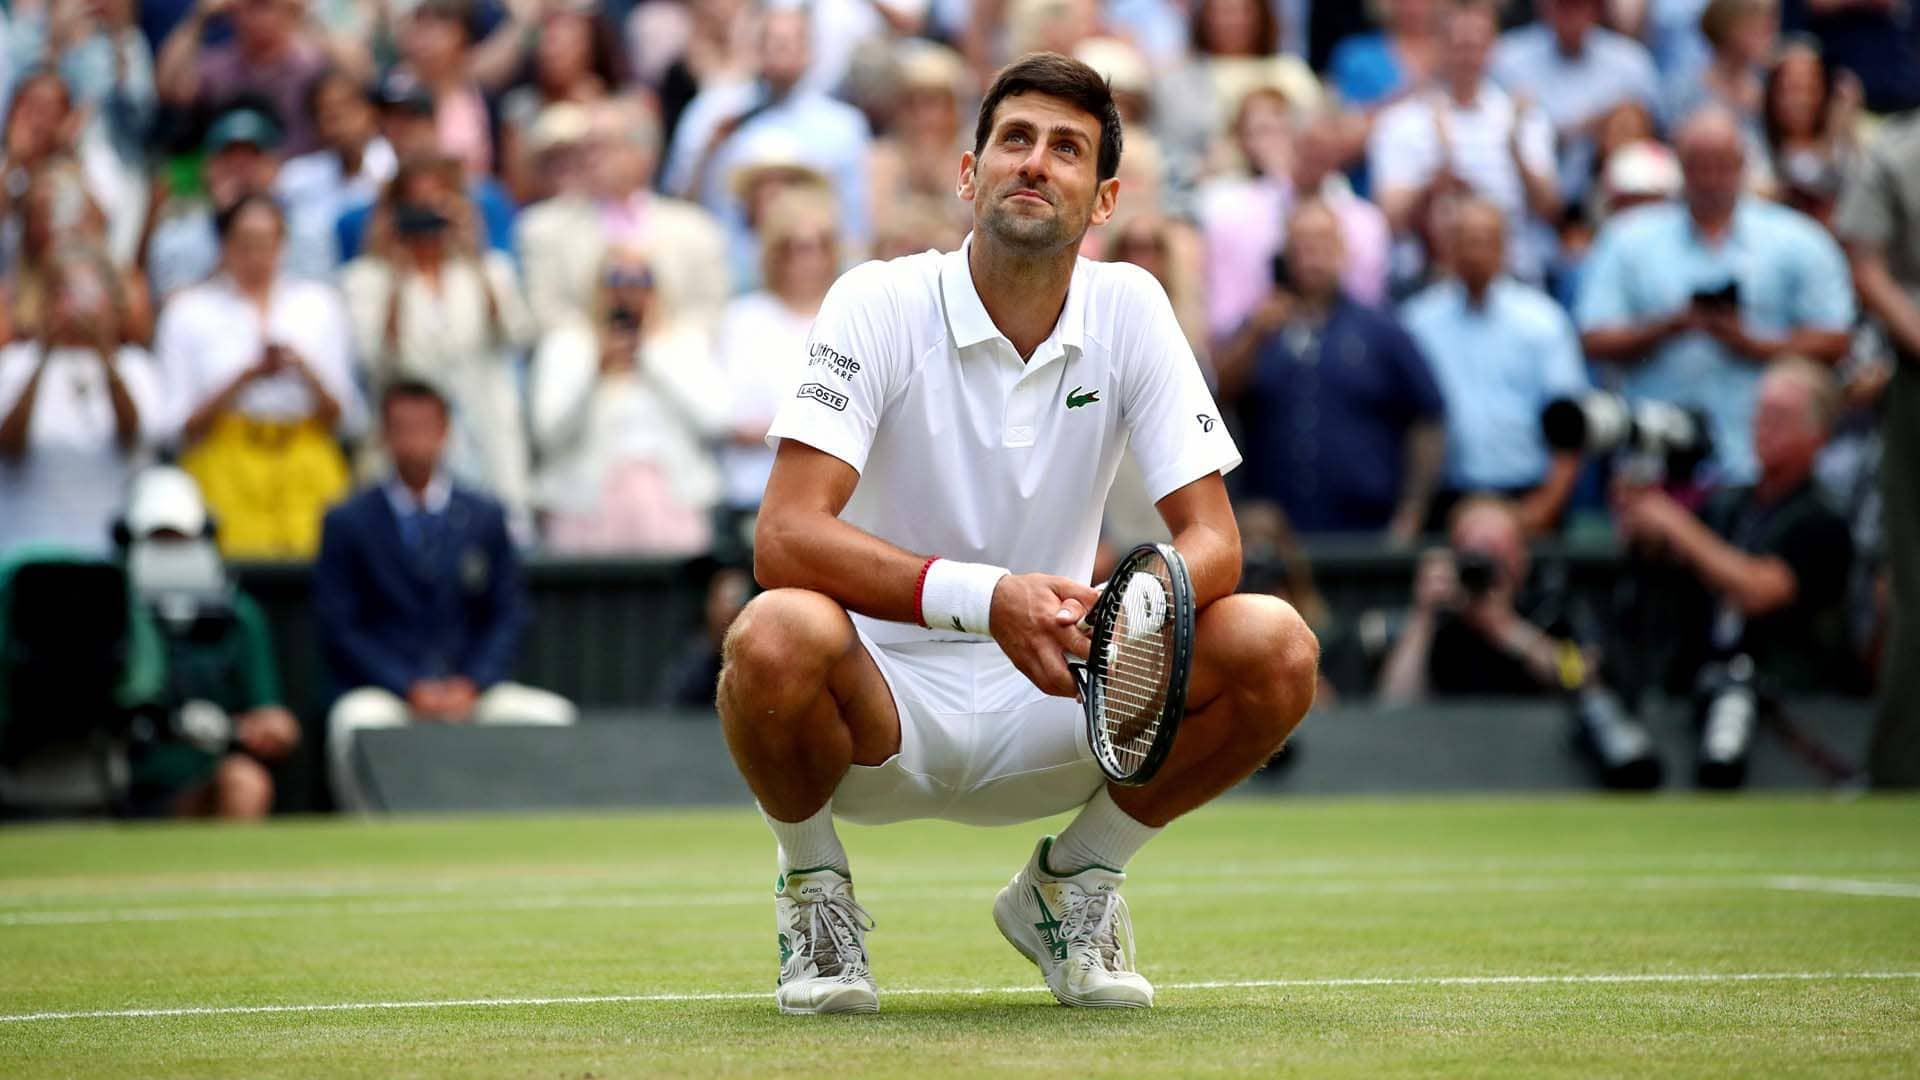 Novak Djokovic podría competir en dobles mixtos en Tokio 2020; así revela un reporte